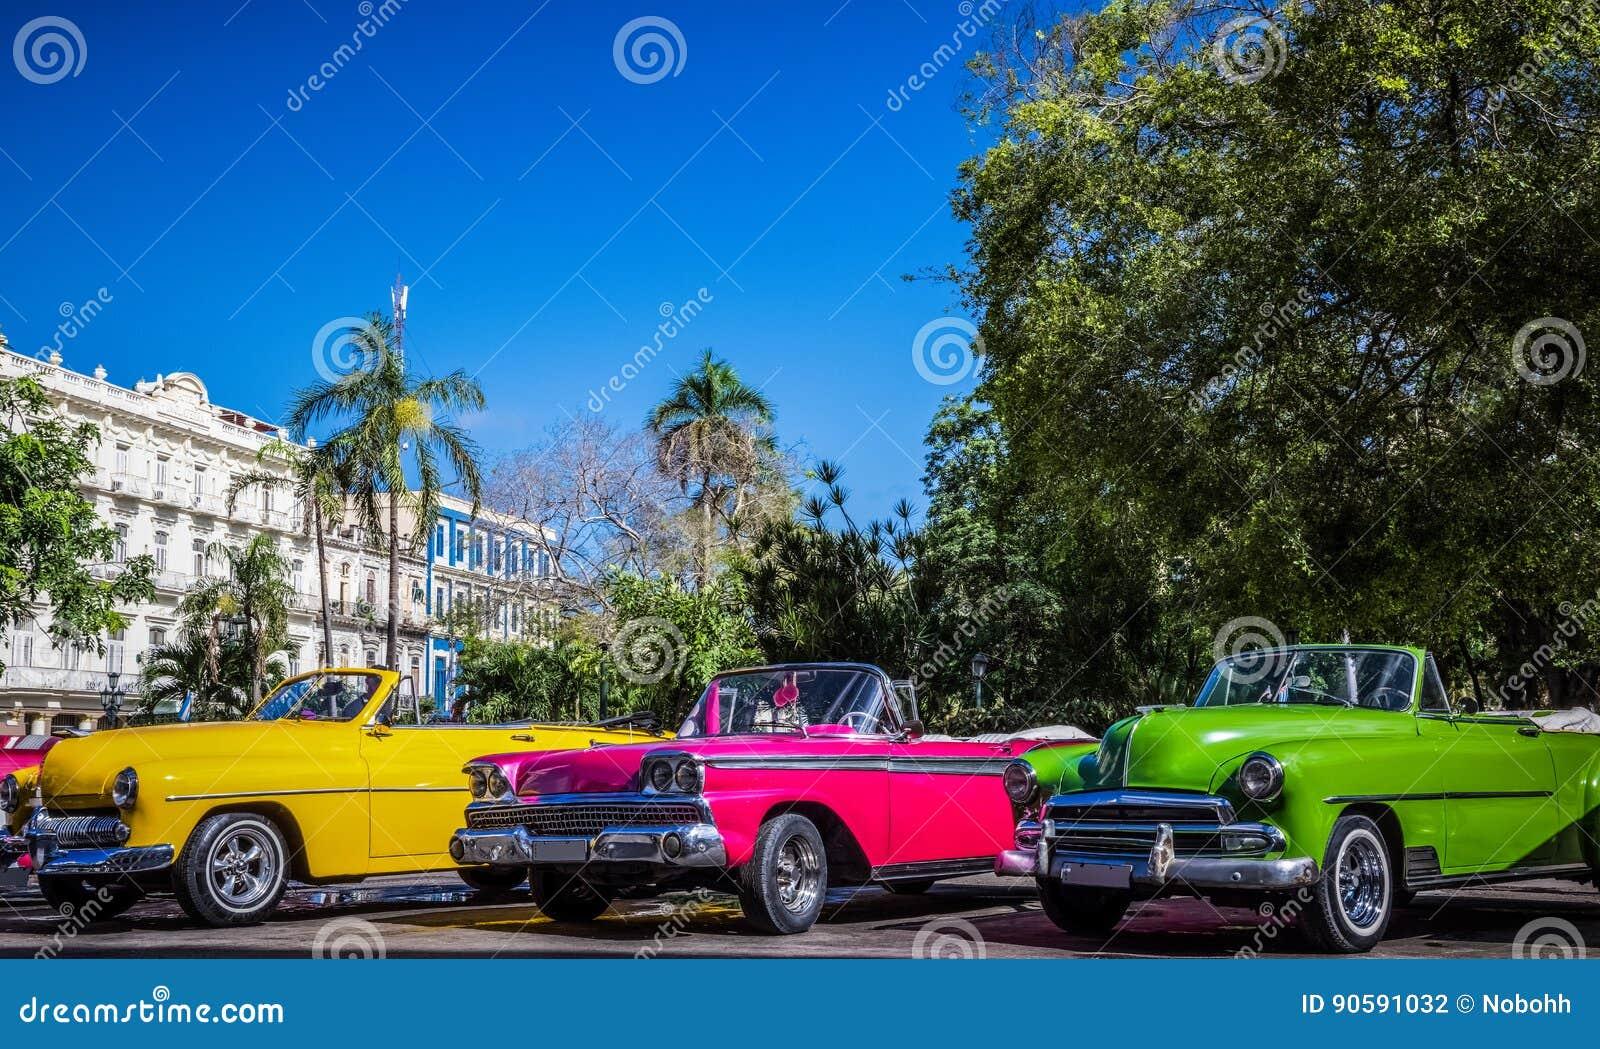 HDR - Όμορφα αμερικανικά μετατρέψιμα εκλεκτής ποιότητας αυτοκίνητα που σταθμεύουν σωρηδόν στην Αβάνα Κούβα πριν από το gran teatr